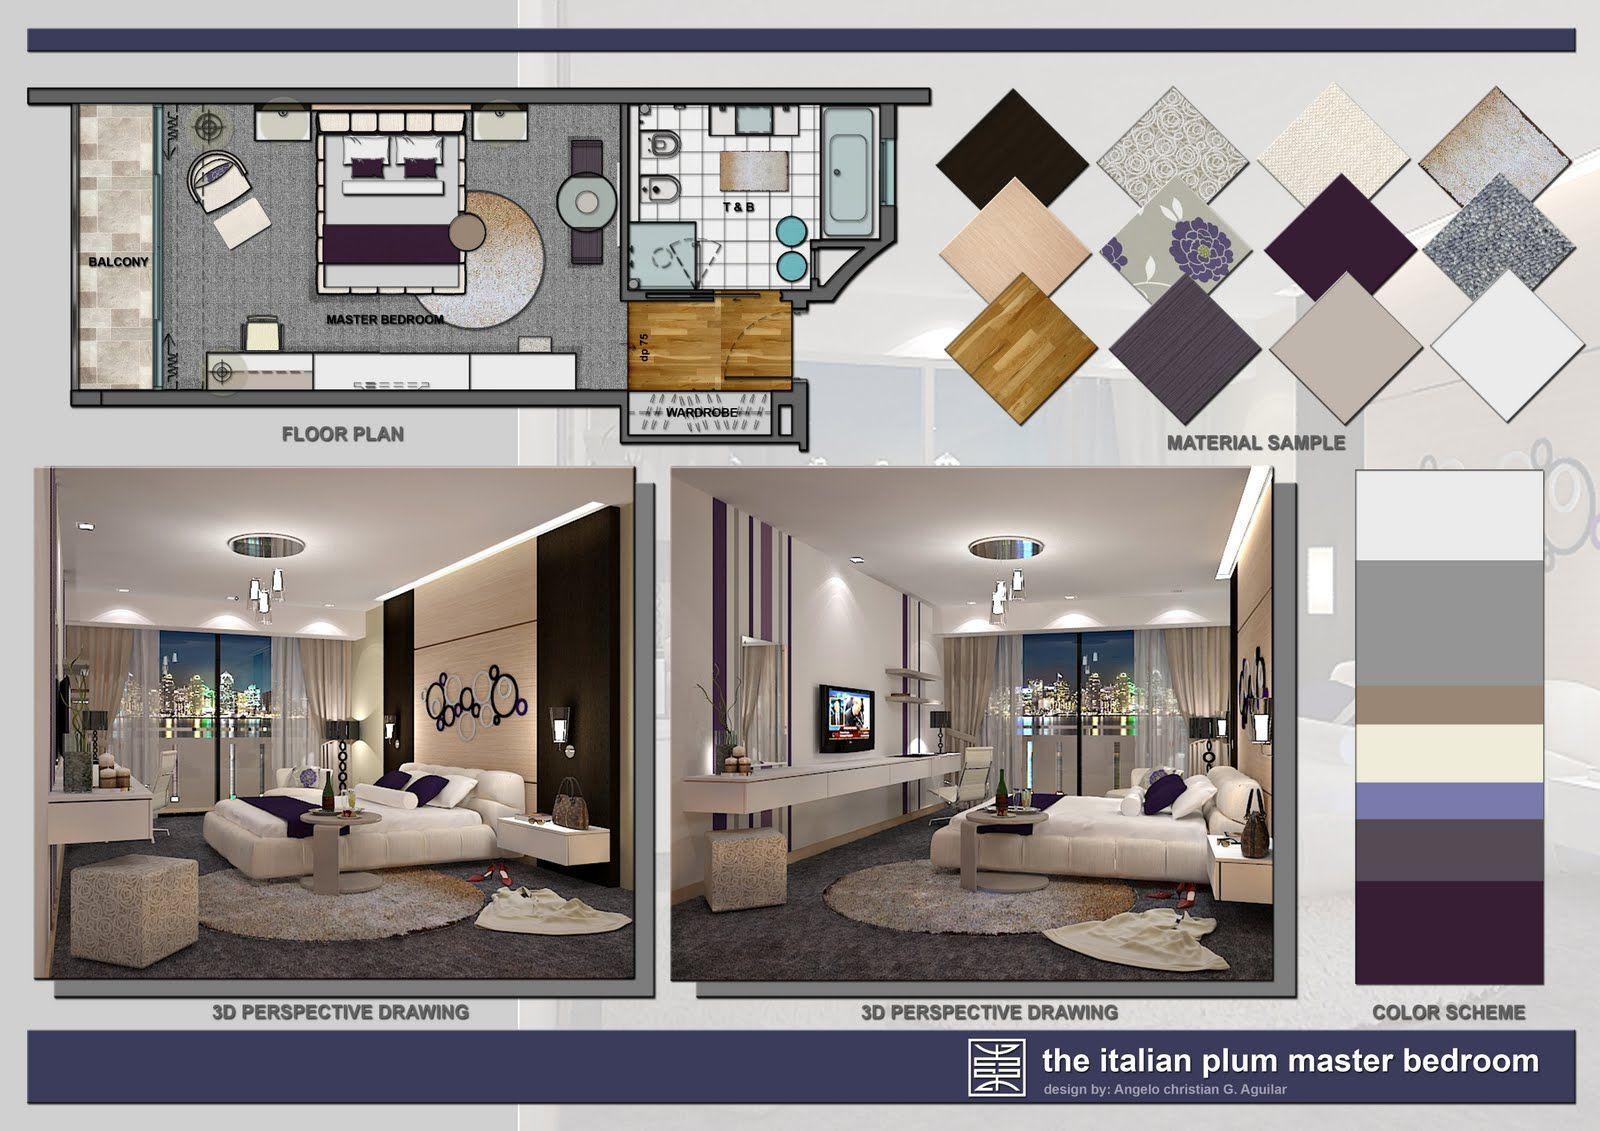 Week 1 Exercise Providing Critique Content Classes Rmcad Online Presentacion De Diseno De Interiores Diseno De Interiores Arquitectura Interior